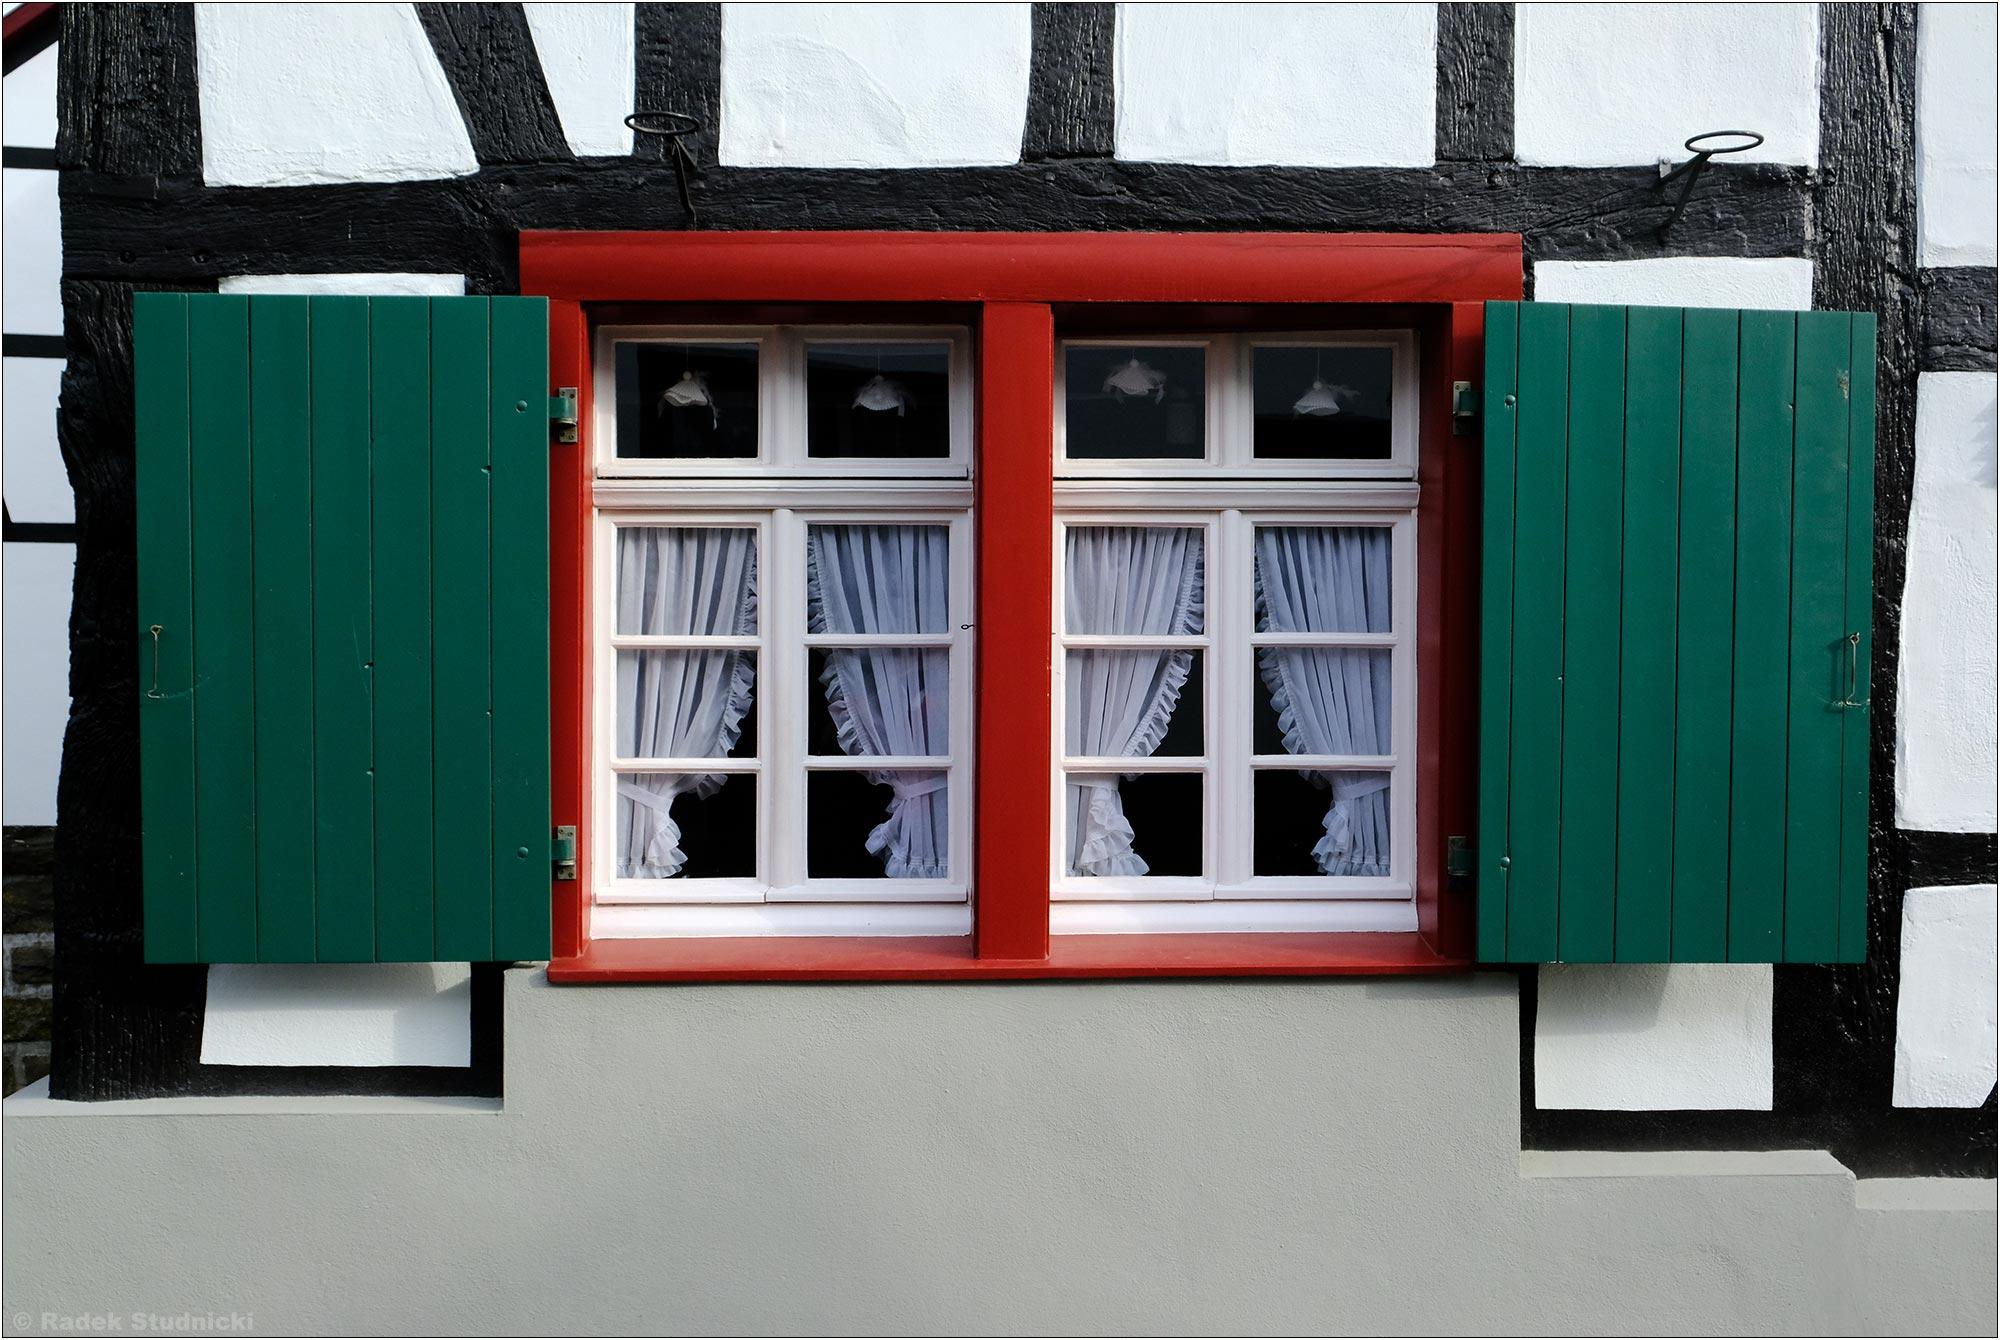 Okno w miasteczku Bad Honnef